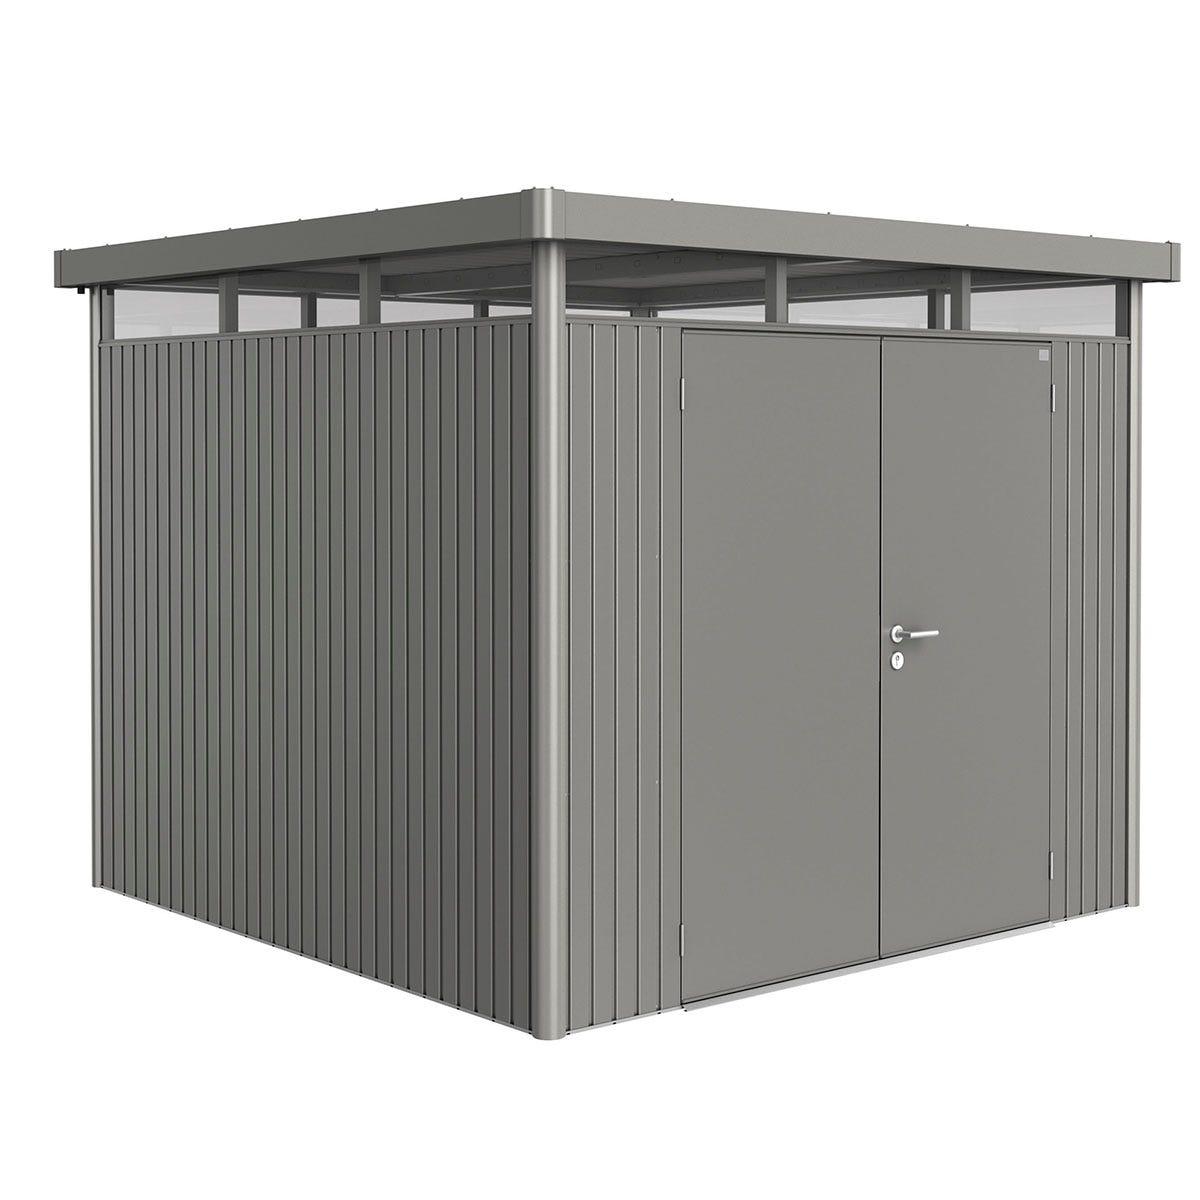 Biohort Highline Metal Shed H4 Double door 9 x 9 - Quartz Grey